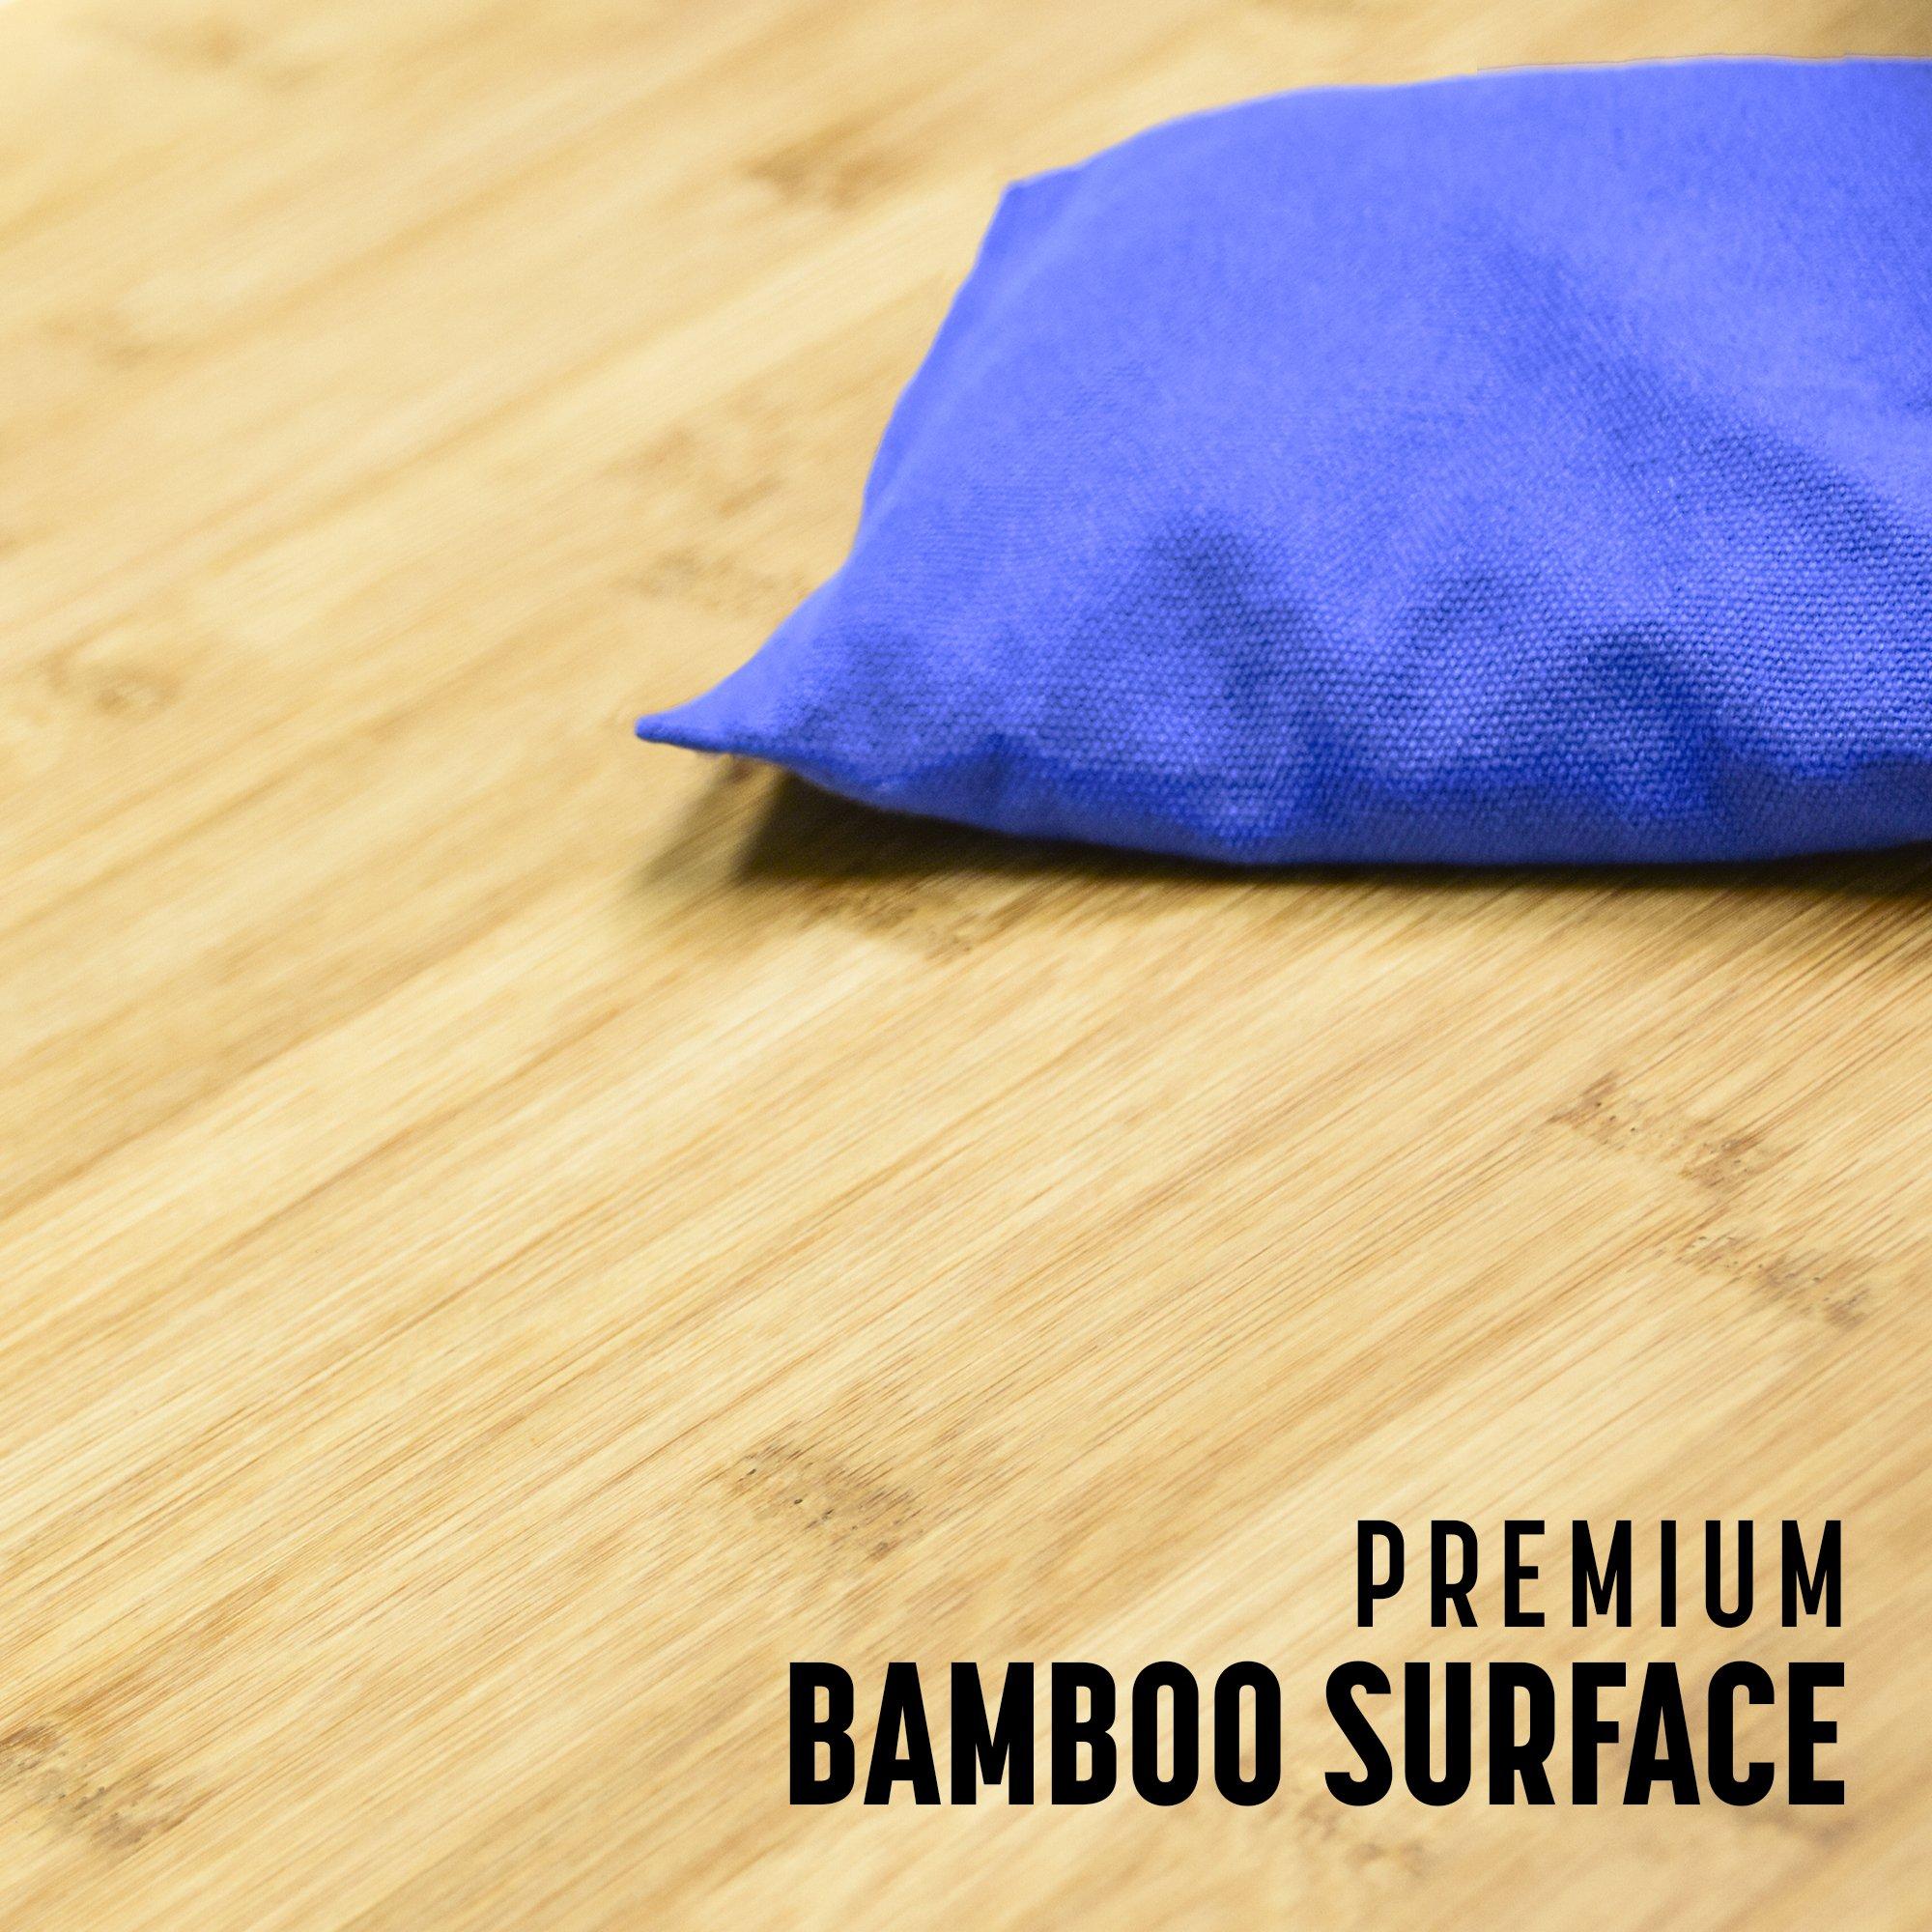 GoSports Bamboo Regulation Size Bamboo Cornhole Set   Includes 8 Bean Bags & Carrying Case by GoSports (Image #6)